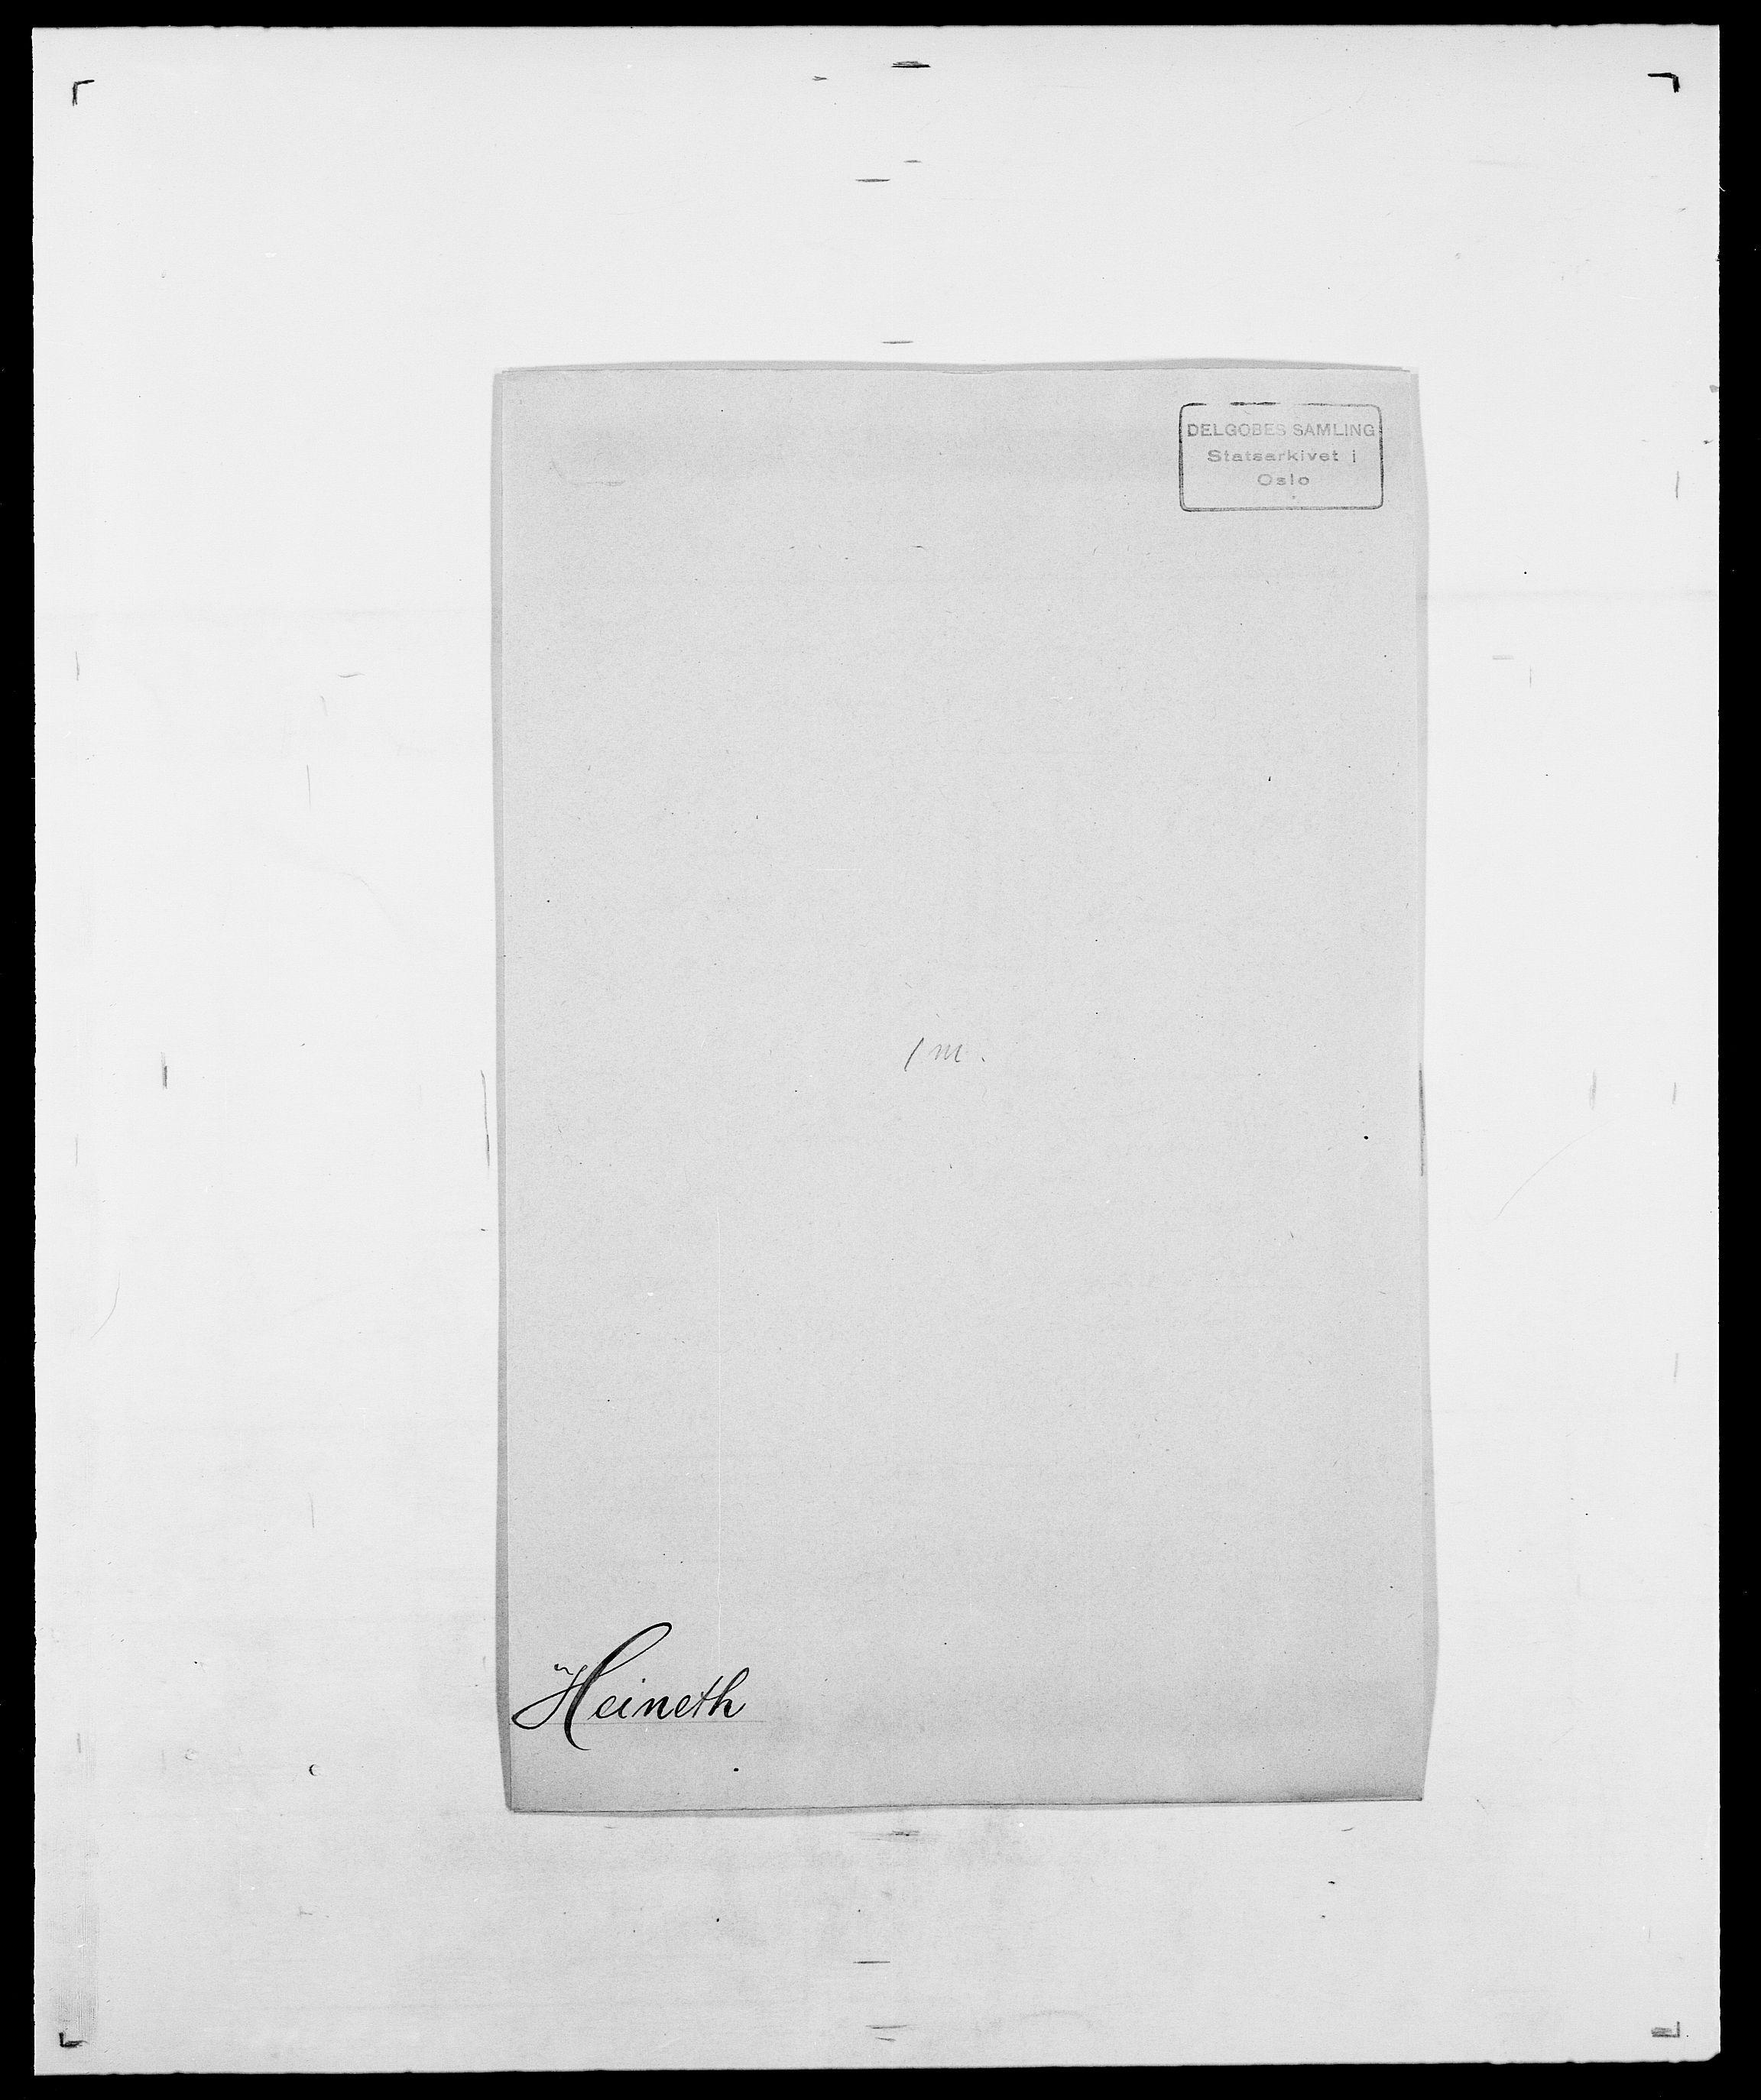 SAO, Delgobe, Charles Antoine - samling, D/Da/L0016: Hamborg - Hektoen, s. 846